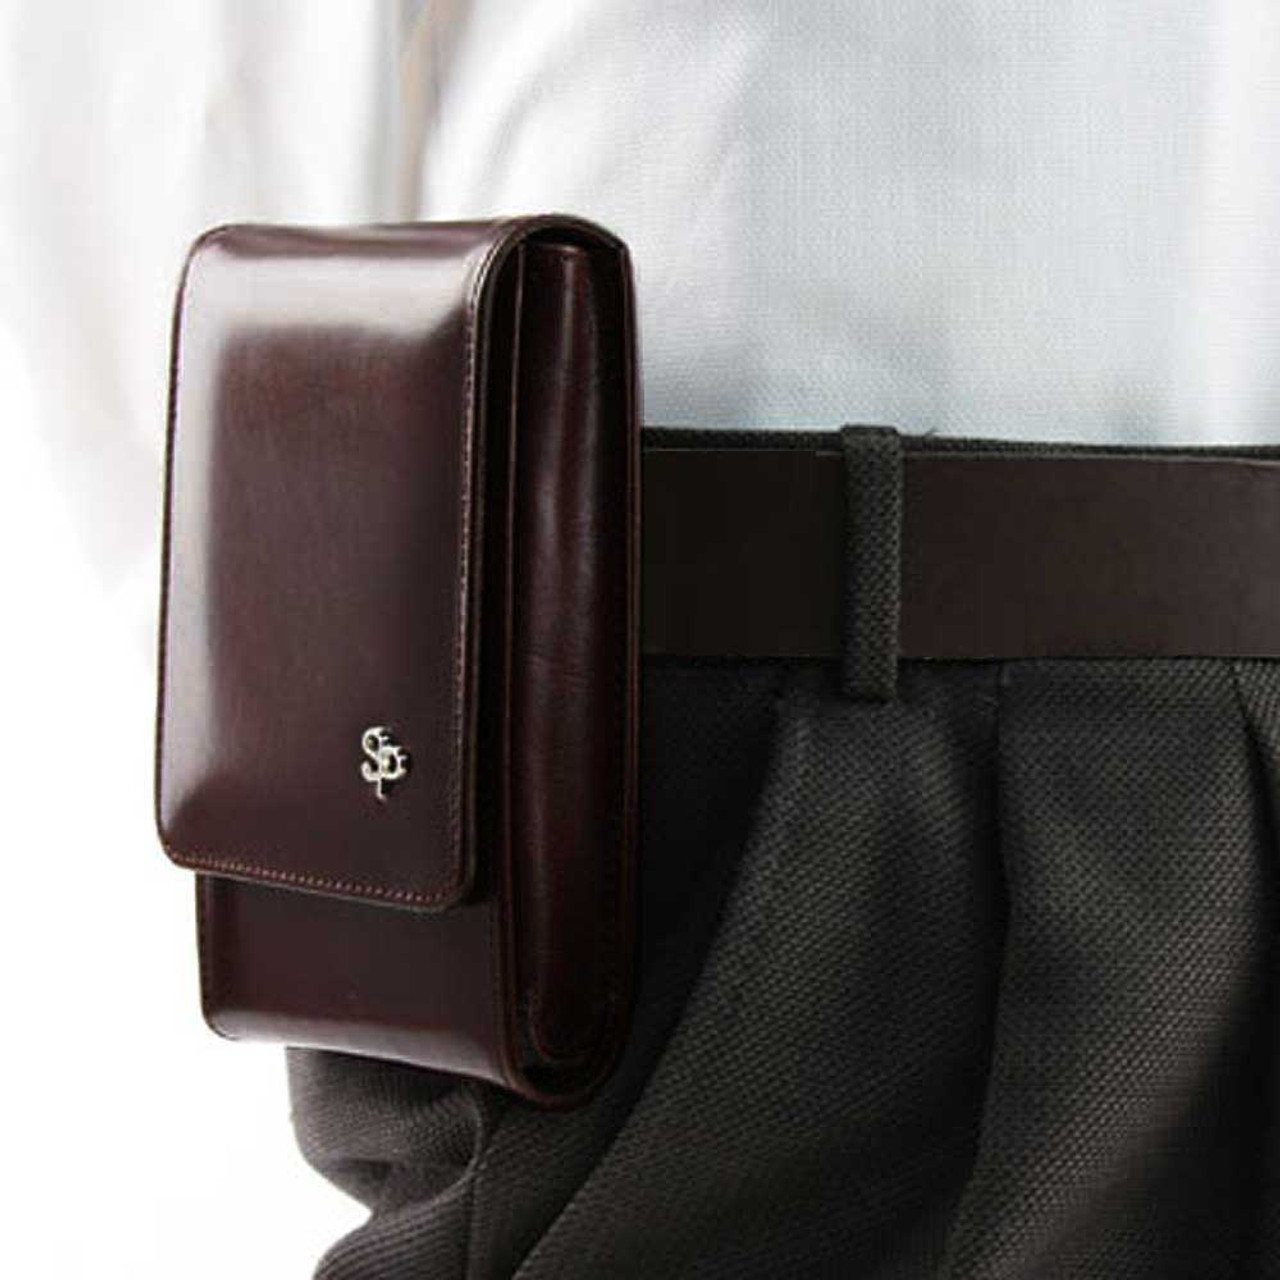 Glock 30 Concealed Carry Holster (Belt Loop)